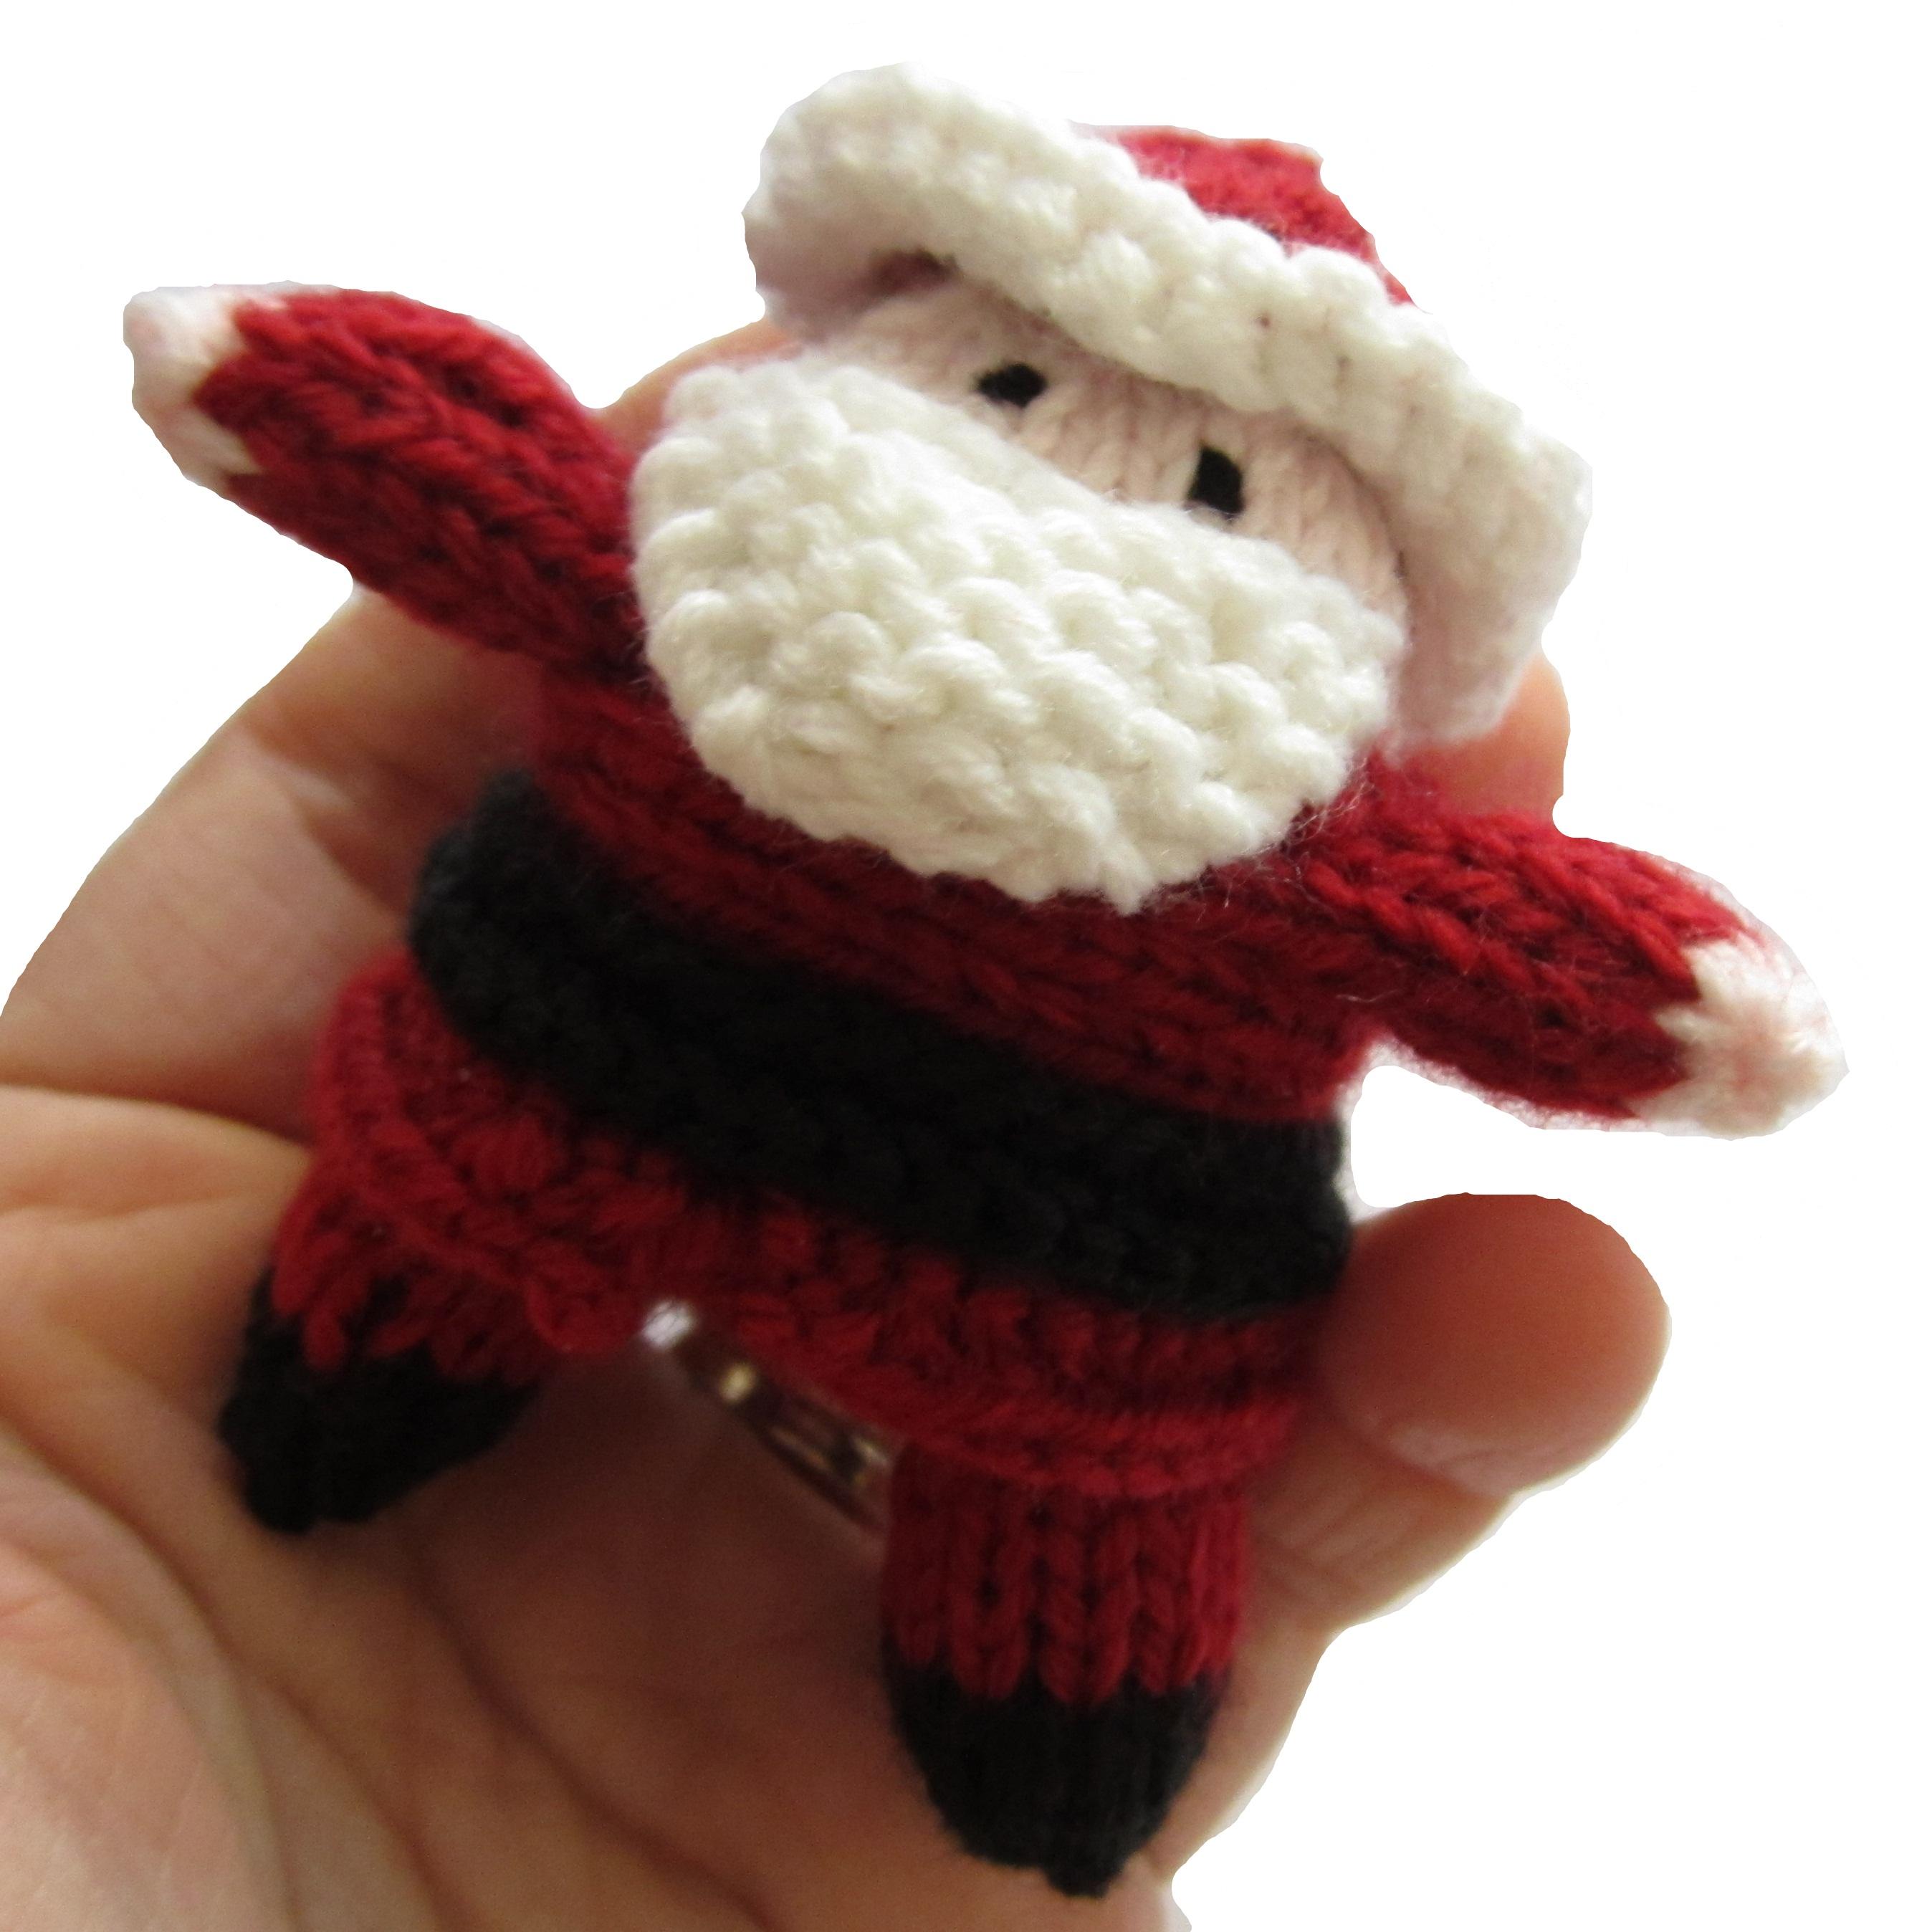 Santa Knitting Patterns Free : 301 Moved Permanently